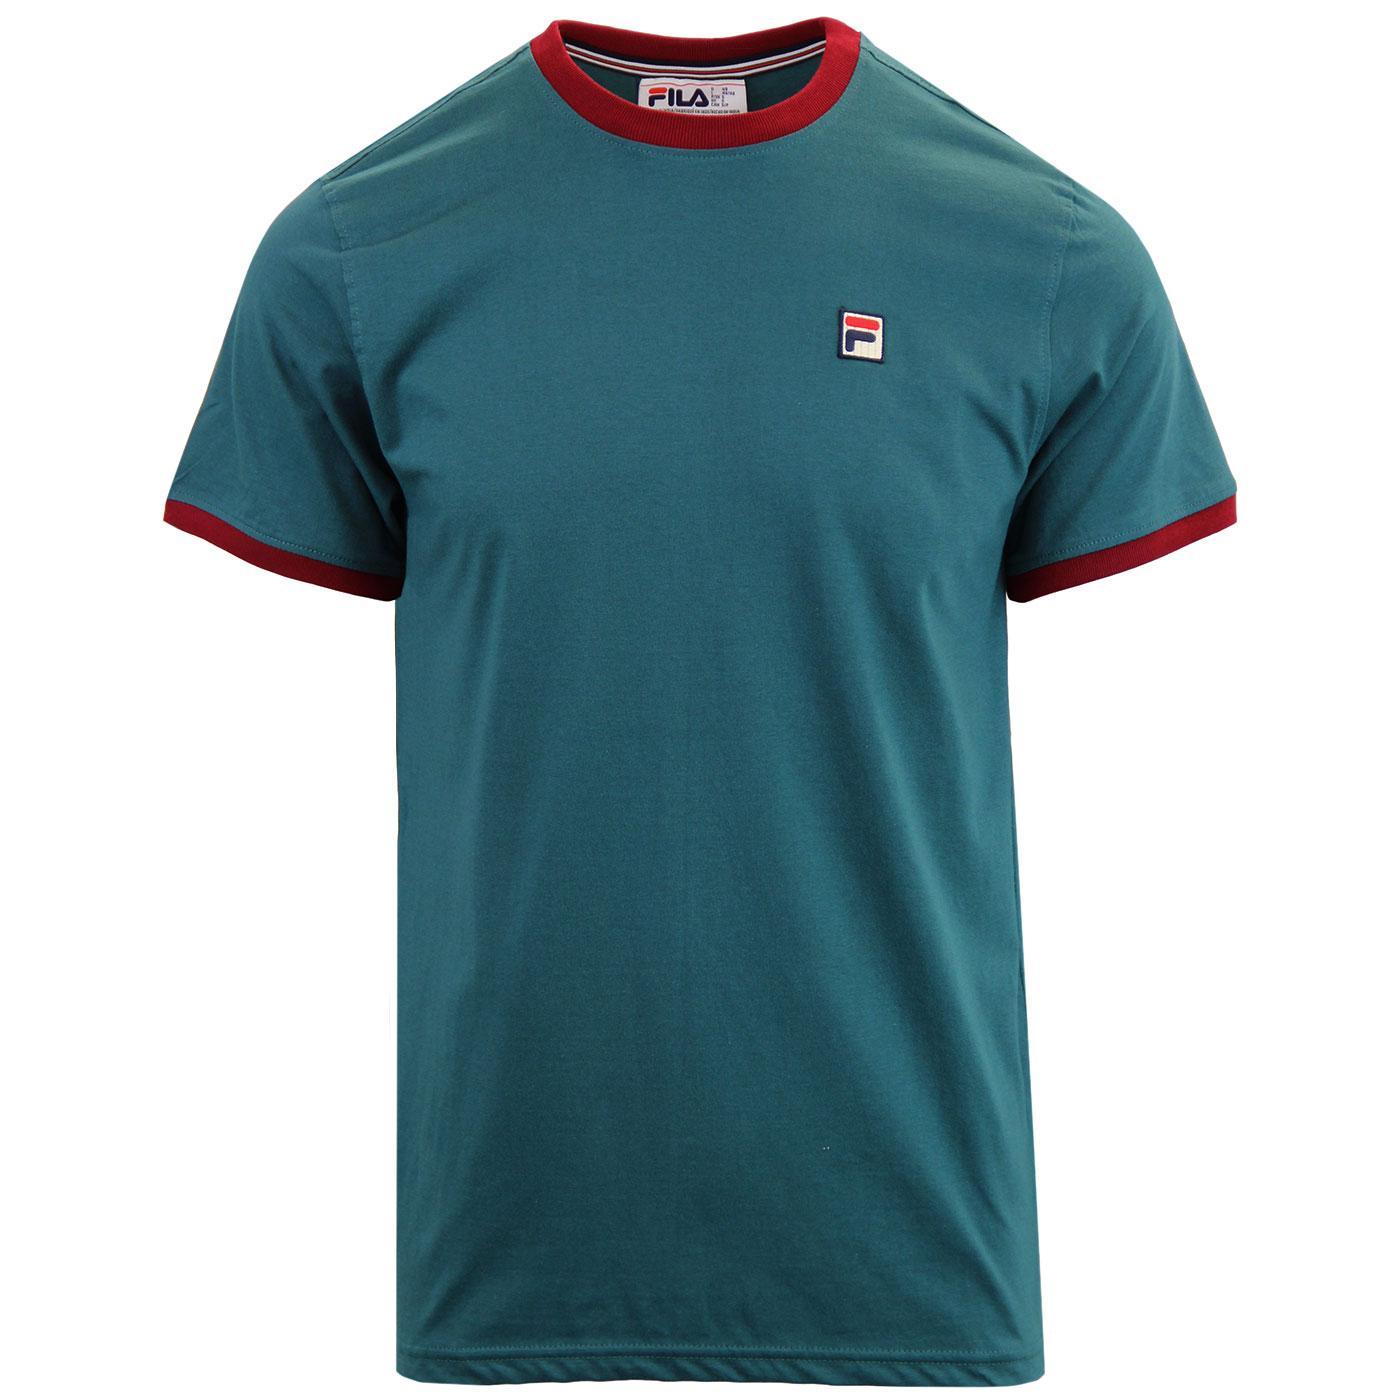 Marconi FILA VINTAGE Retro 70s Ringer T-Shirt (AD)